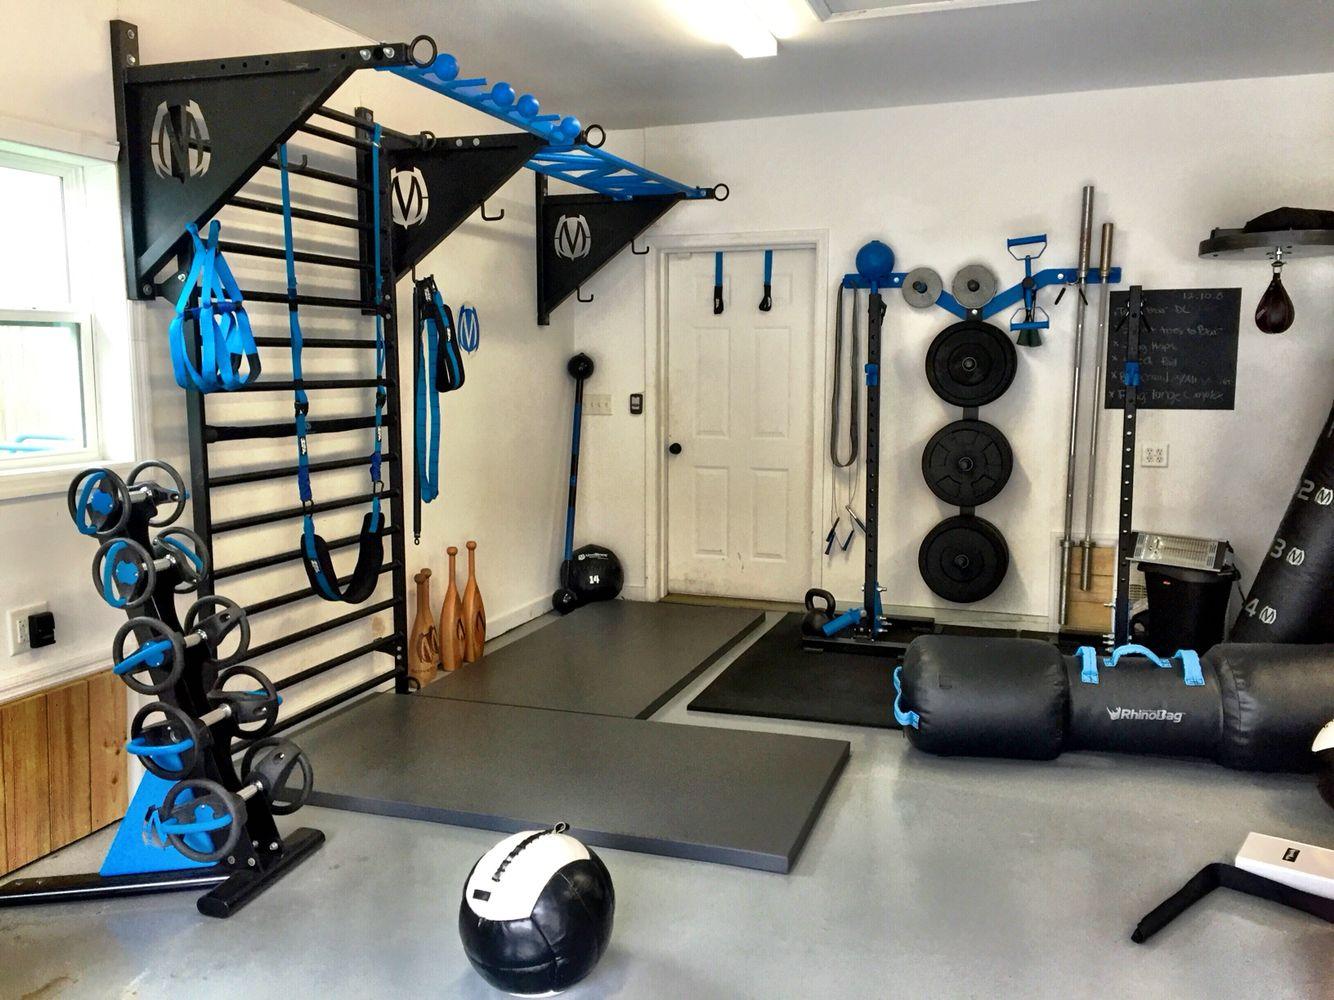 Home Gym Equipment Storage Ideas